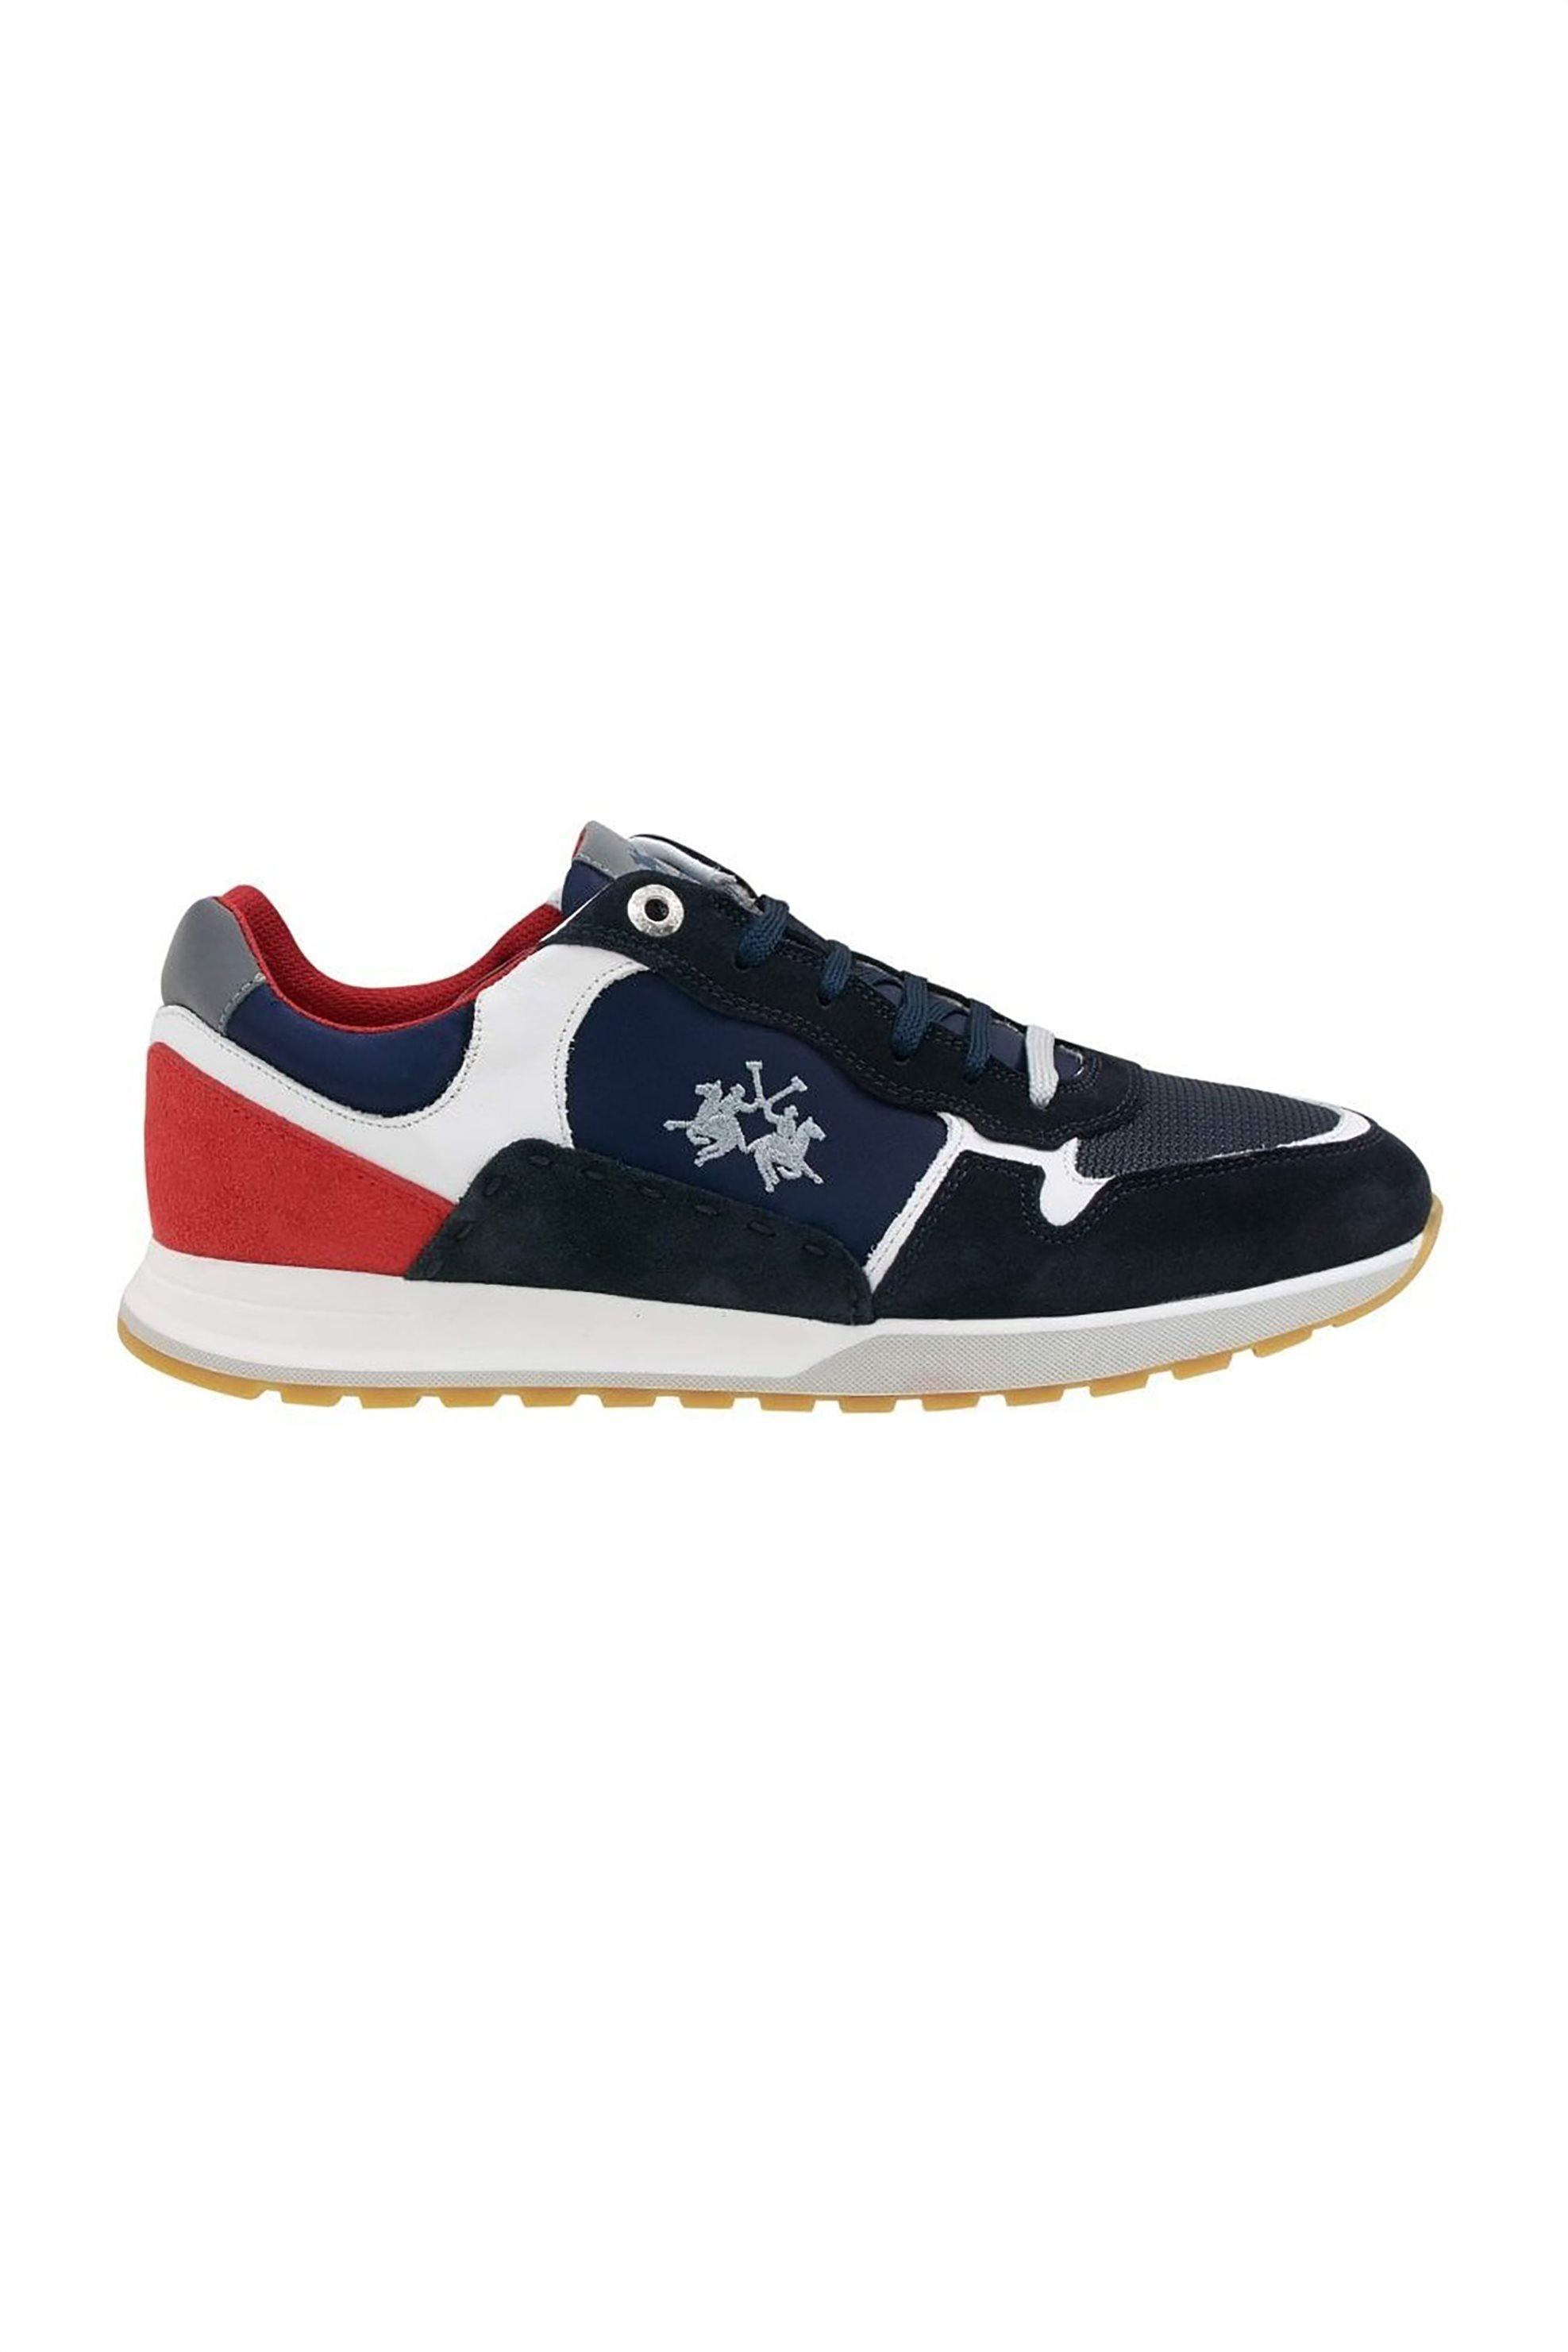 La Martina ανδρικά sneakers colourblocked με suede στοιχεία – LFM211050-2210 – Μπλε Σκούρο